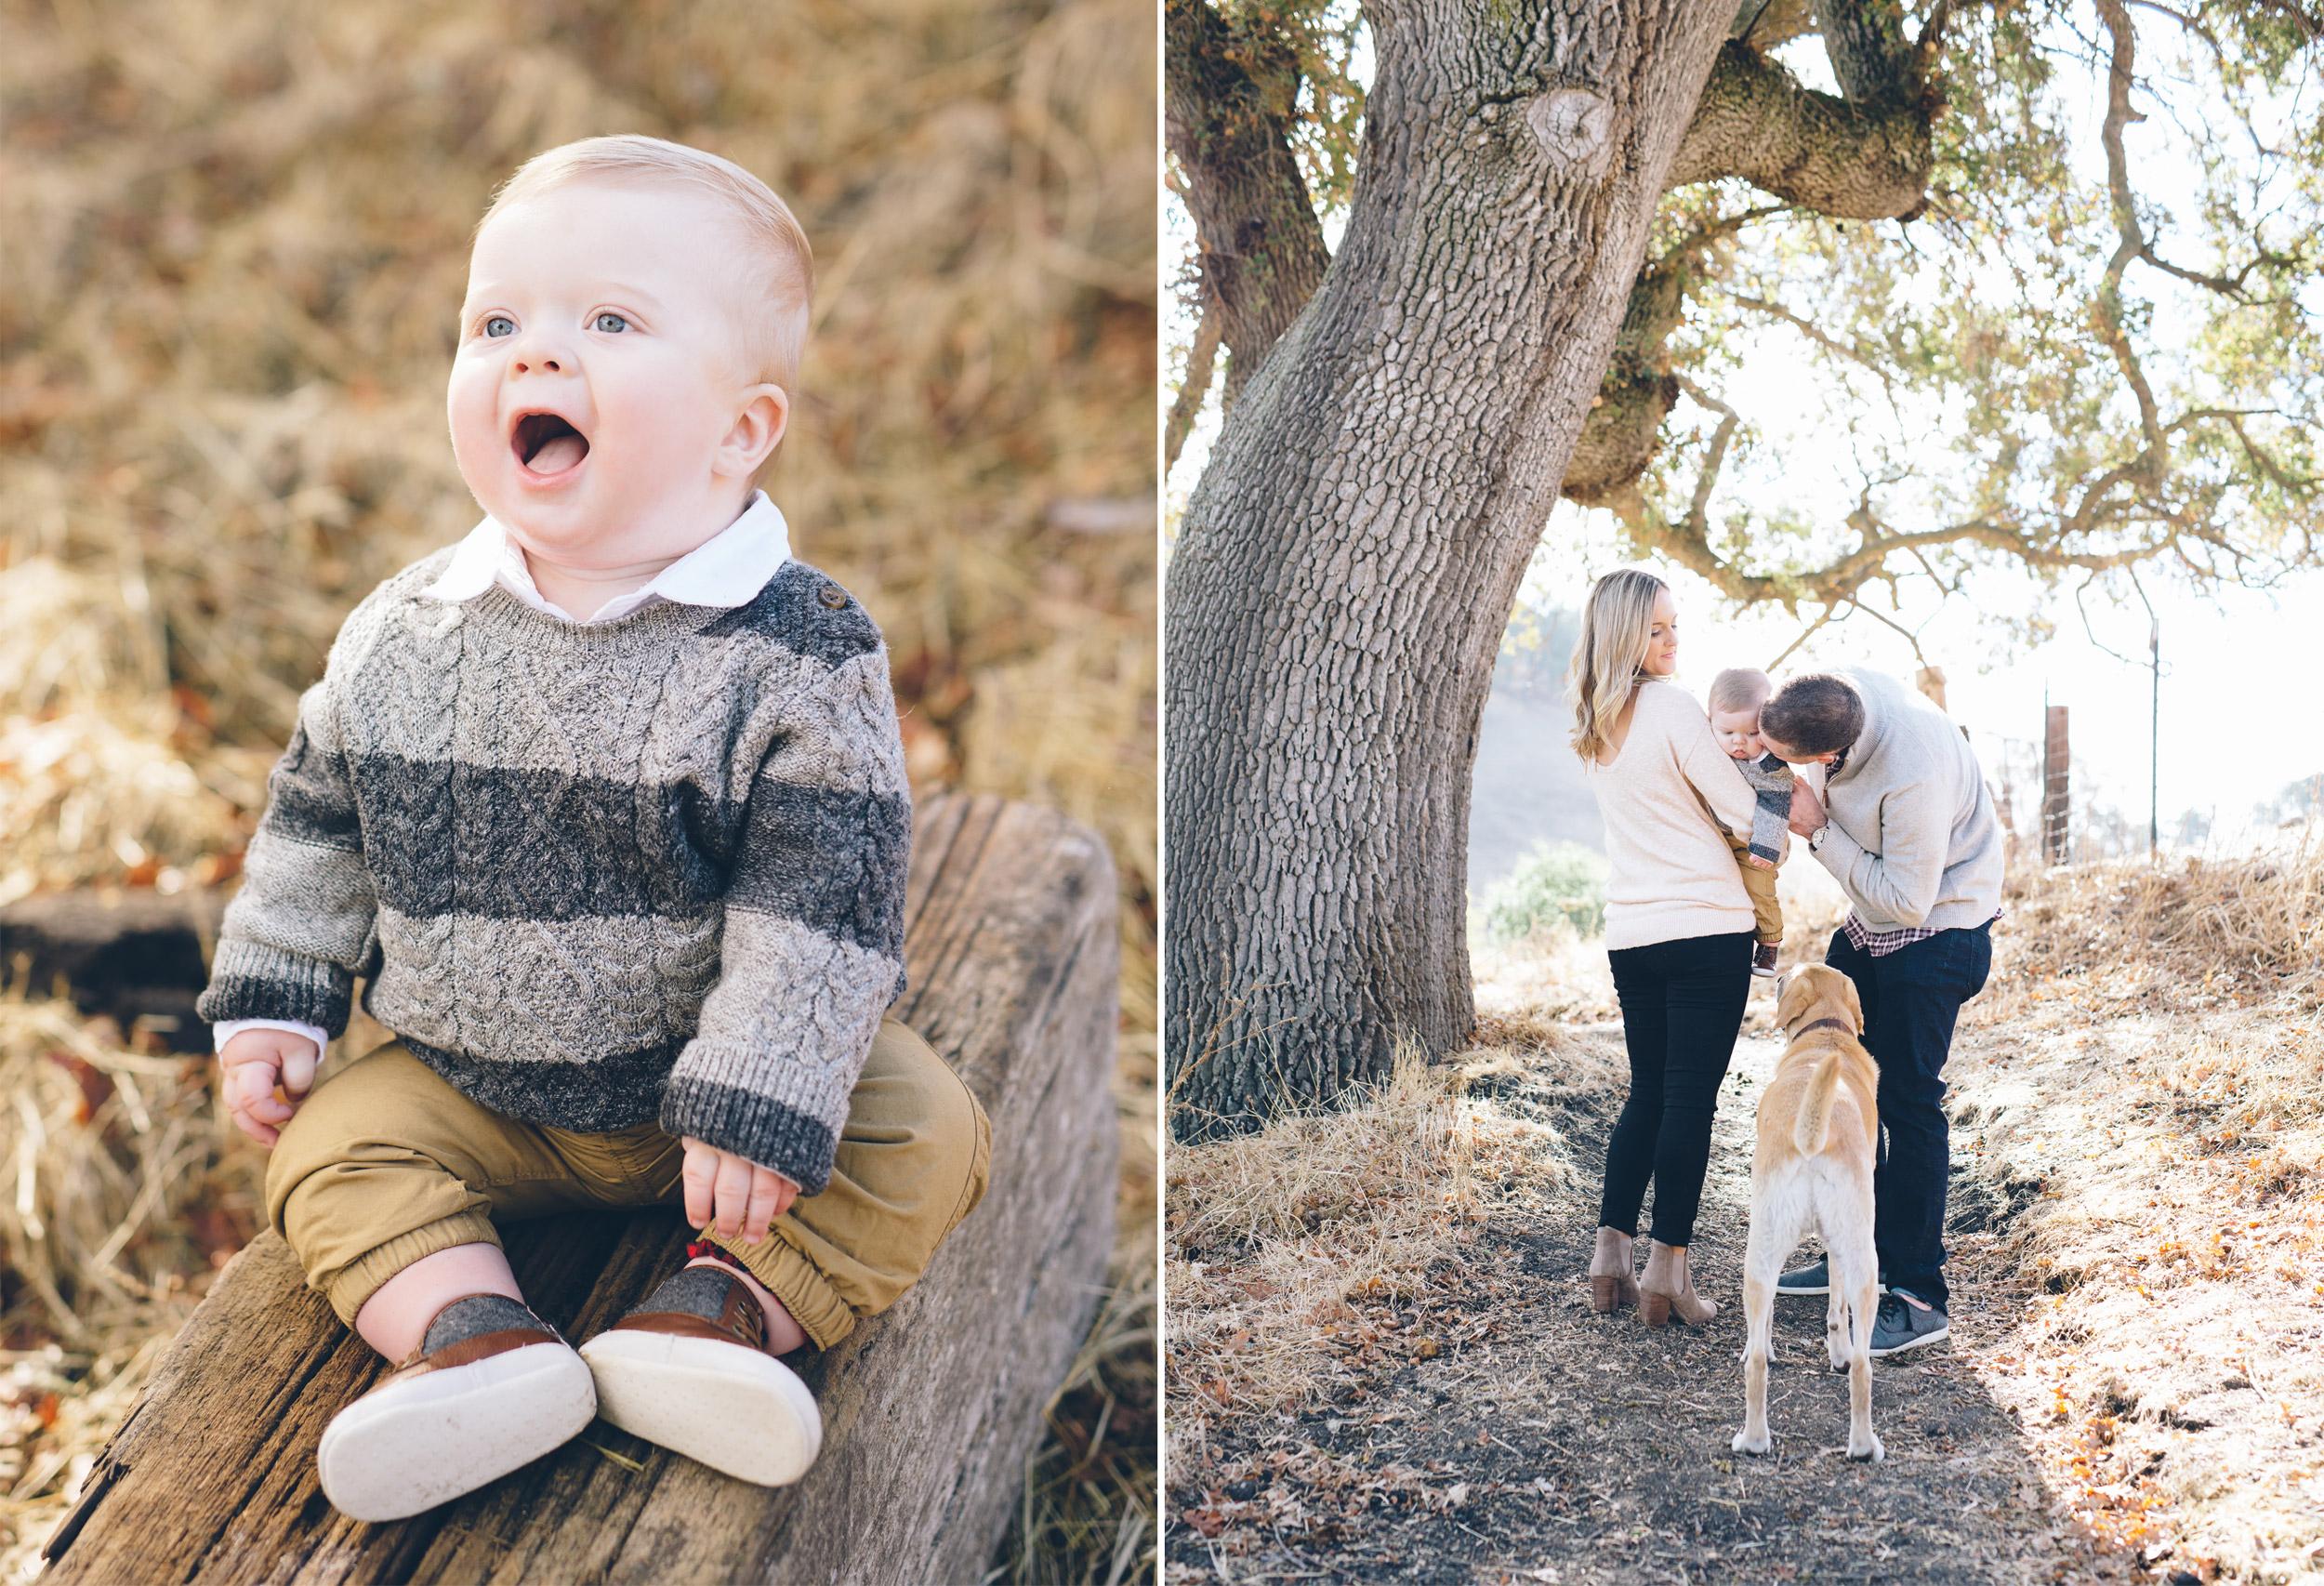 walnut-creek-family-photographer-5.jpg